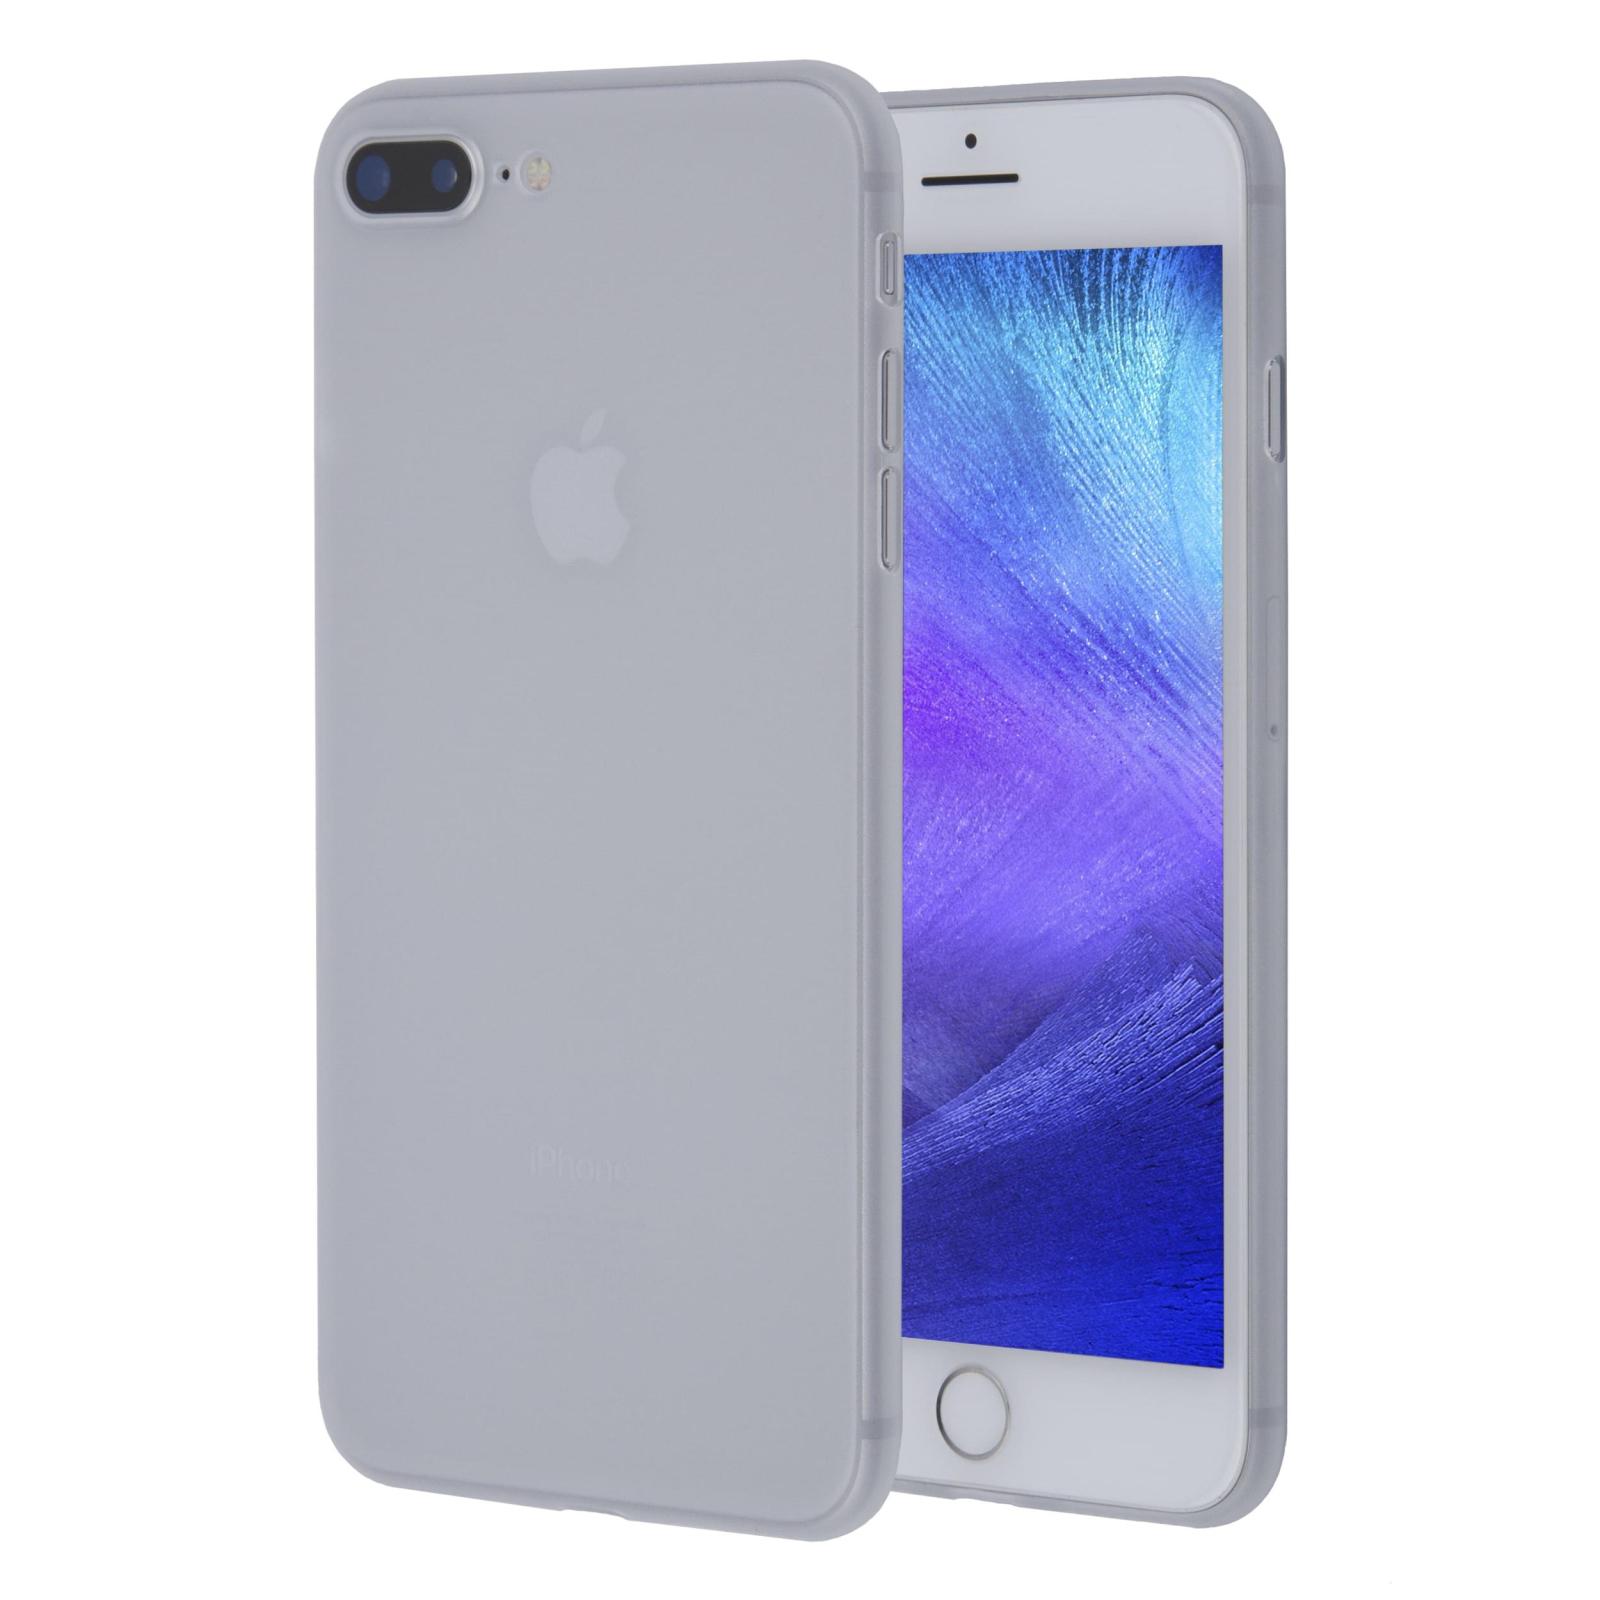 Чехол для моб. телефона MakeFuture Ice Case (PP) Apple iPhone 8 Plus White (MCI-AI8PWH) изображение 3